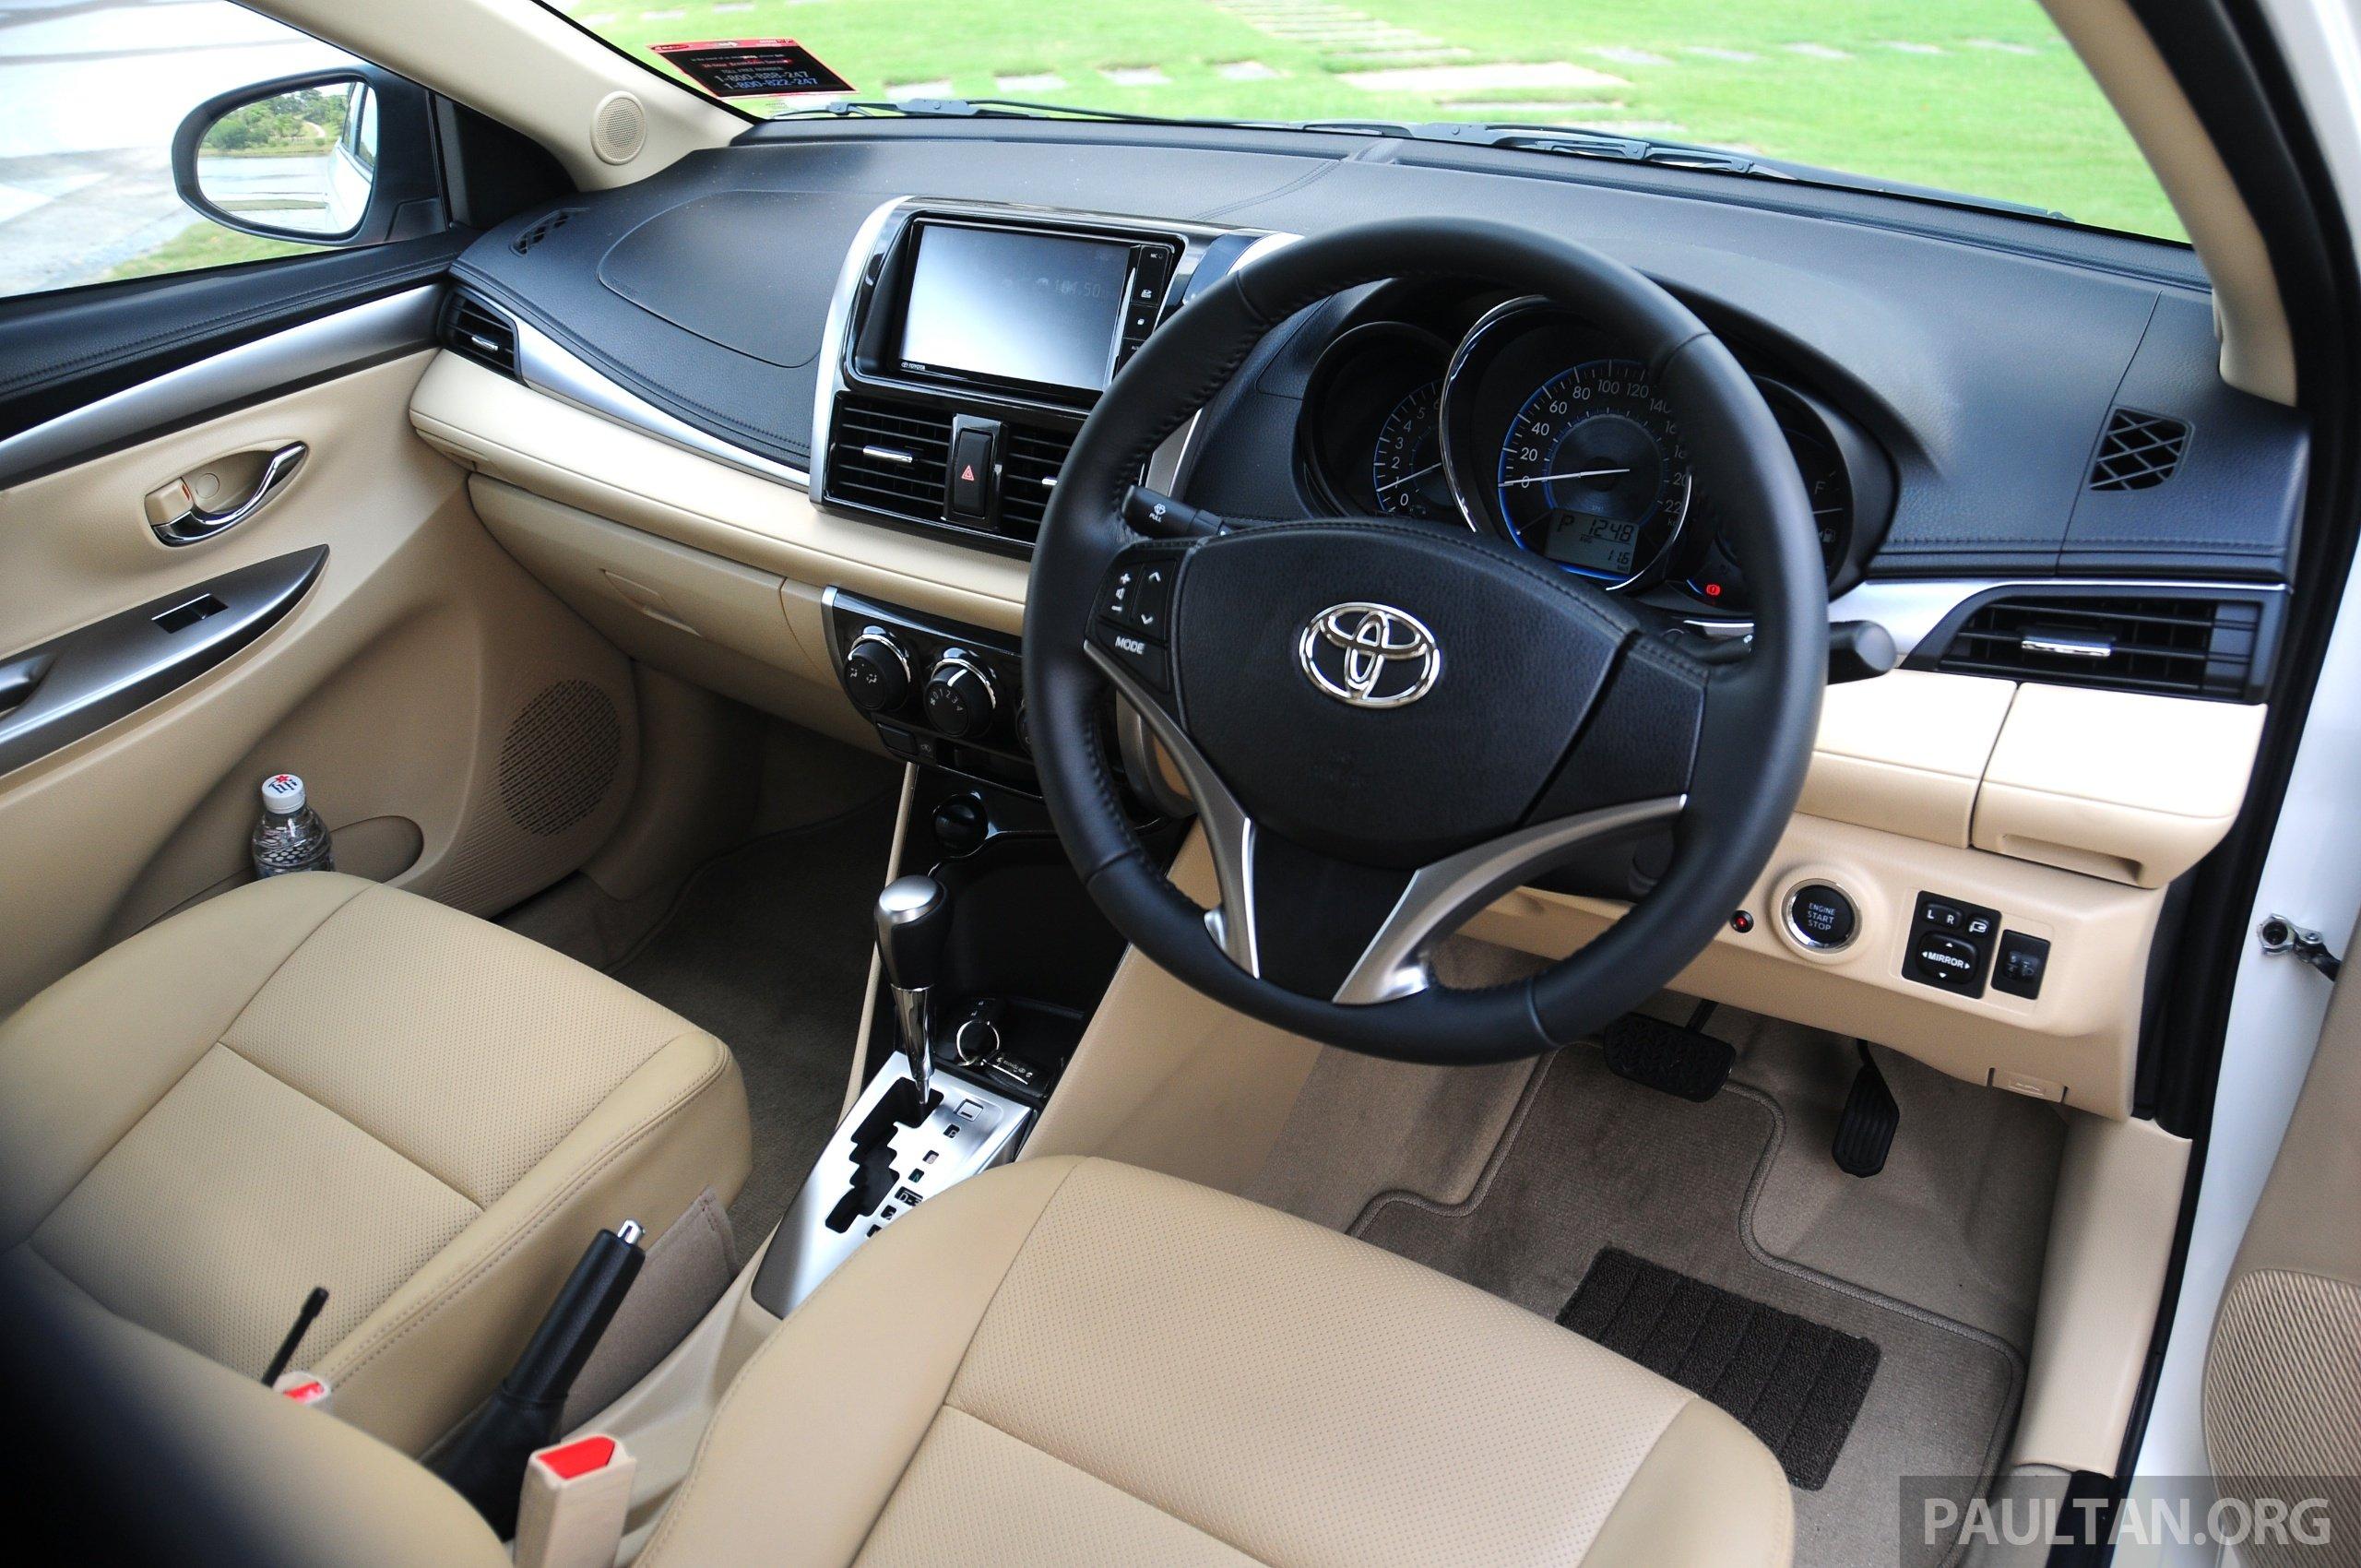 DRIVEN: 2013 Toyota Vios 1.5 G sampled in Putrajaya